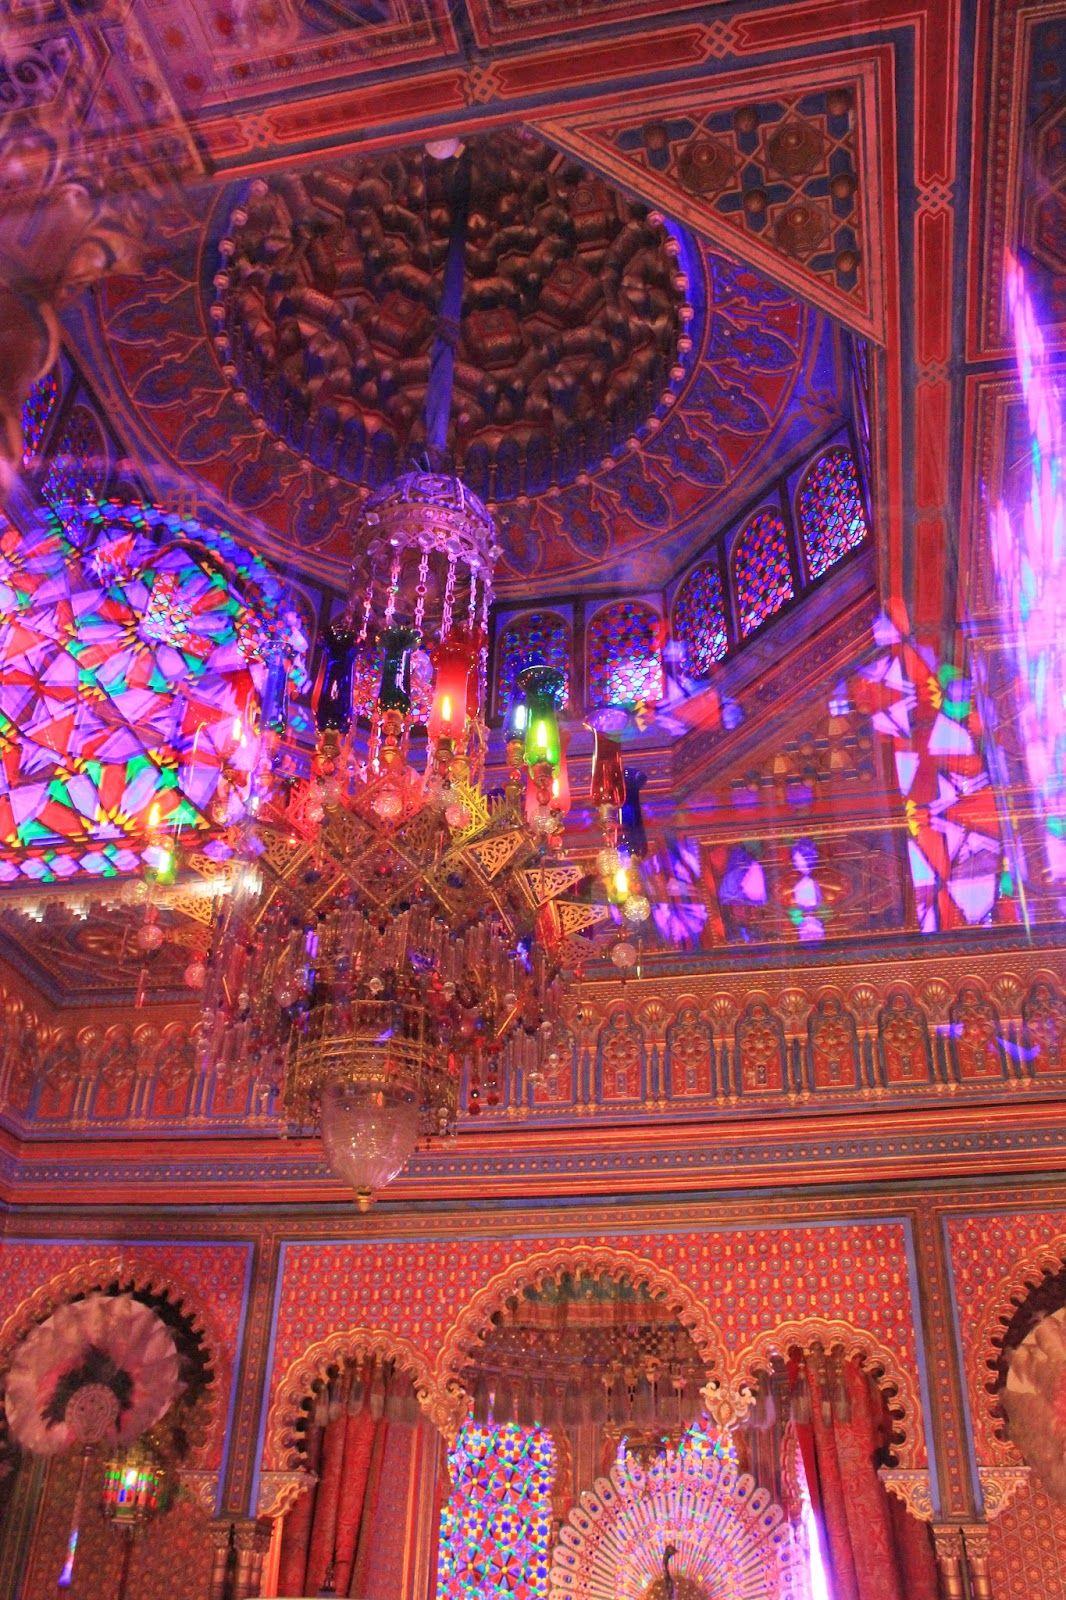 Fairytale Linderhof Palace With It S Moorish Kiosk Purchased By King Ludwig Ii Of Bavaria Moorish Architecture Inside Castles Beautiful Architecture